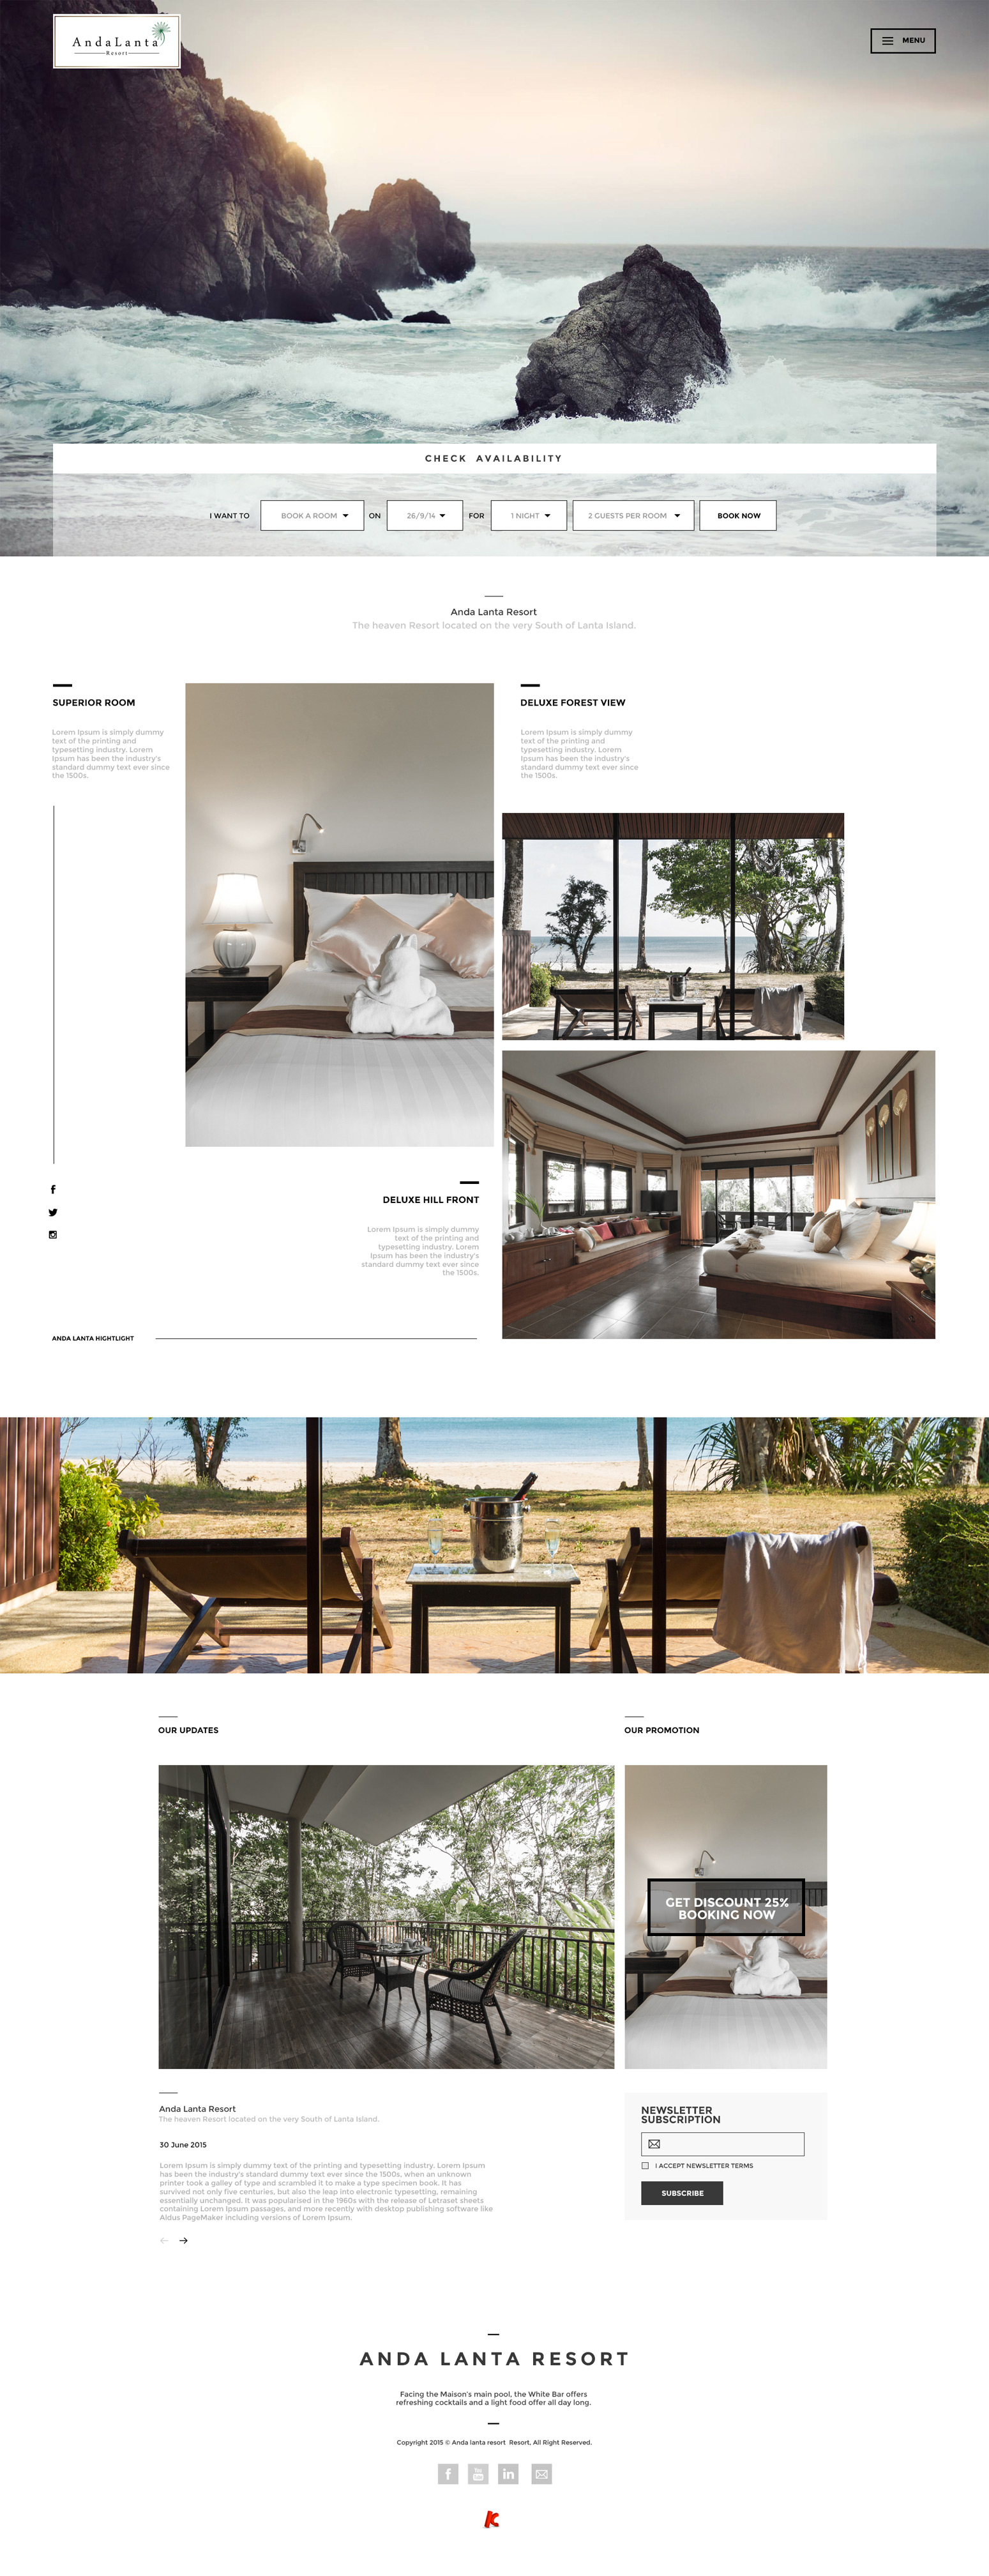 KOS Design - ANDA LANTA